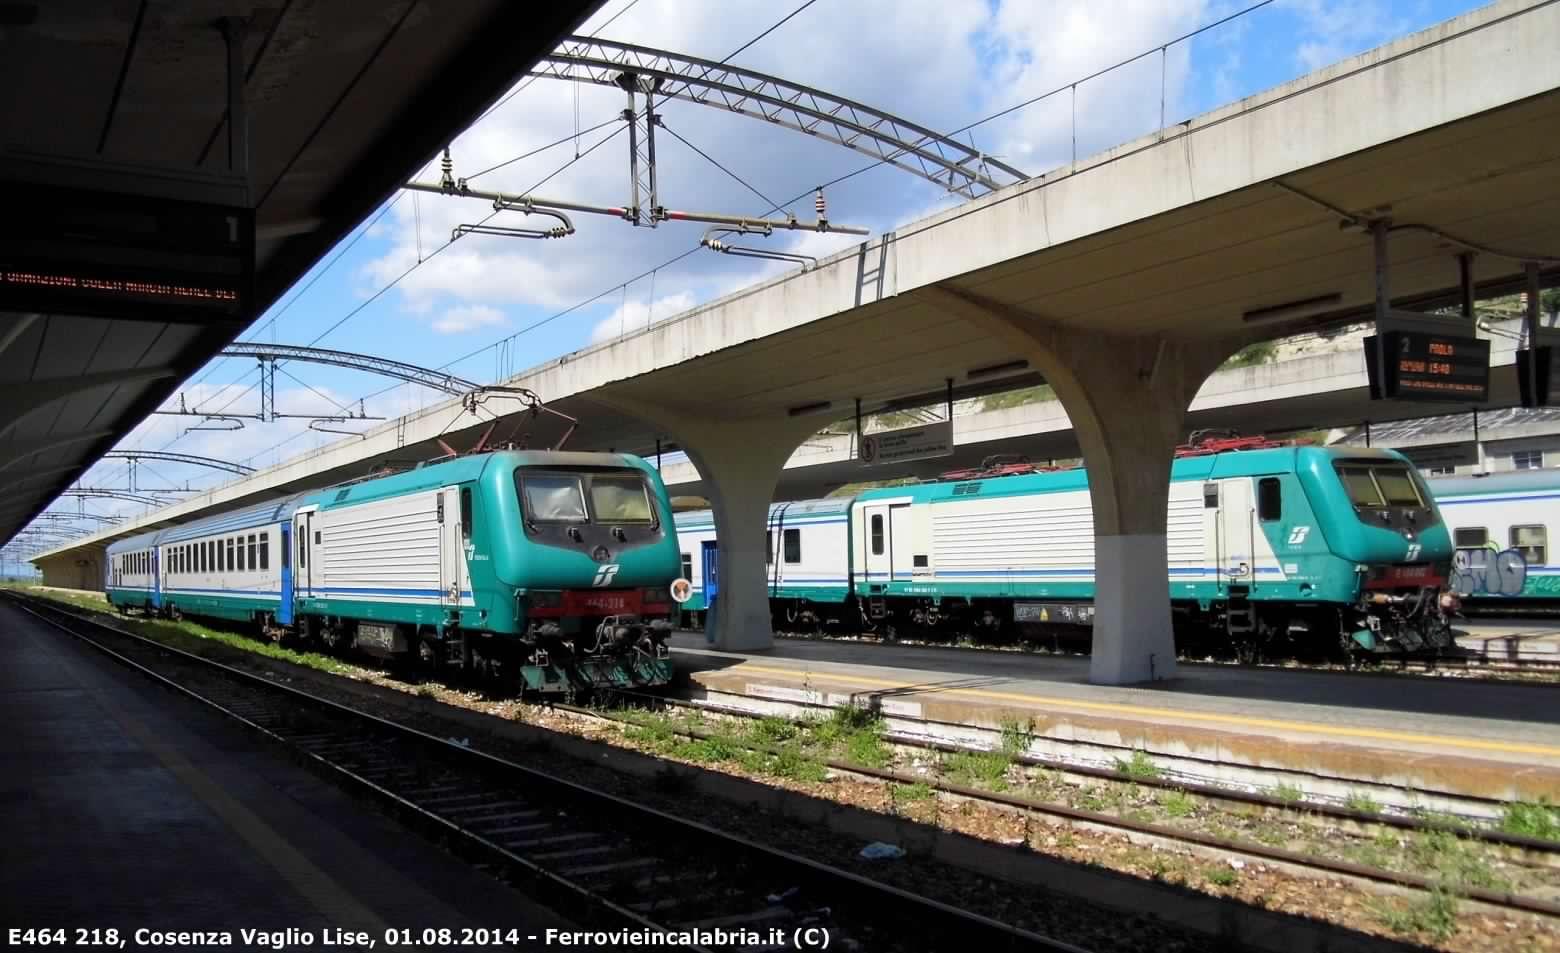 E464 218-CosenzaVaglioLise-2014-08-01-RobertoGalati